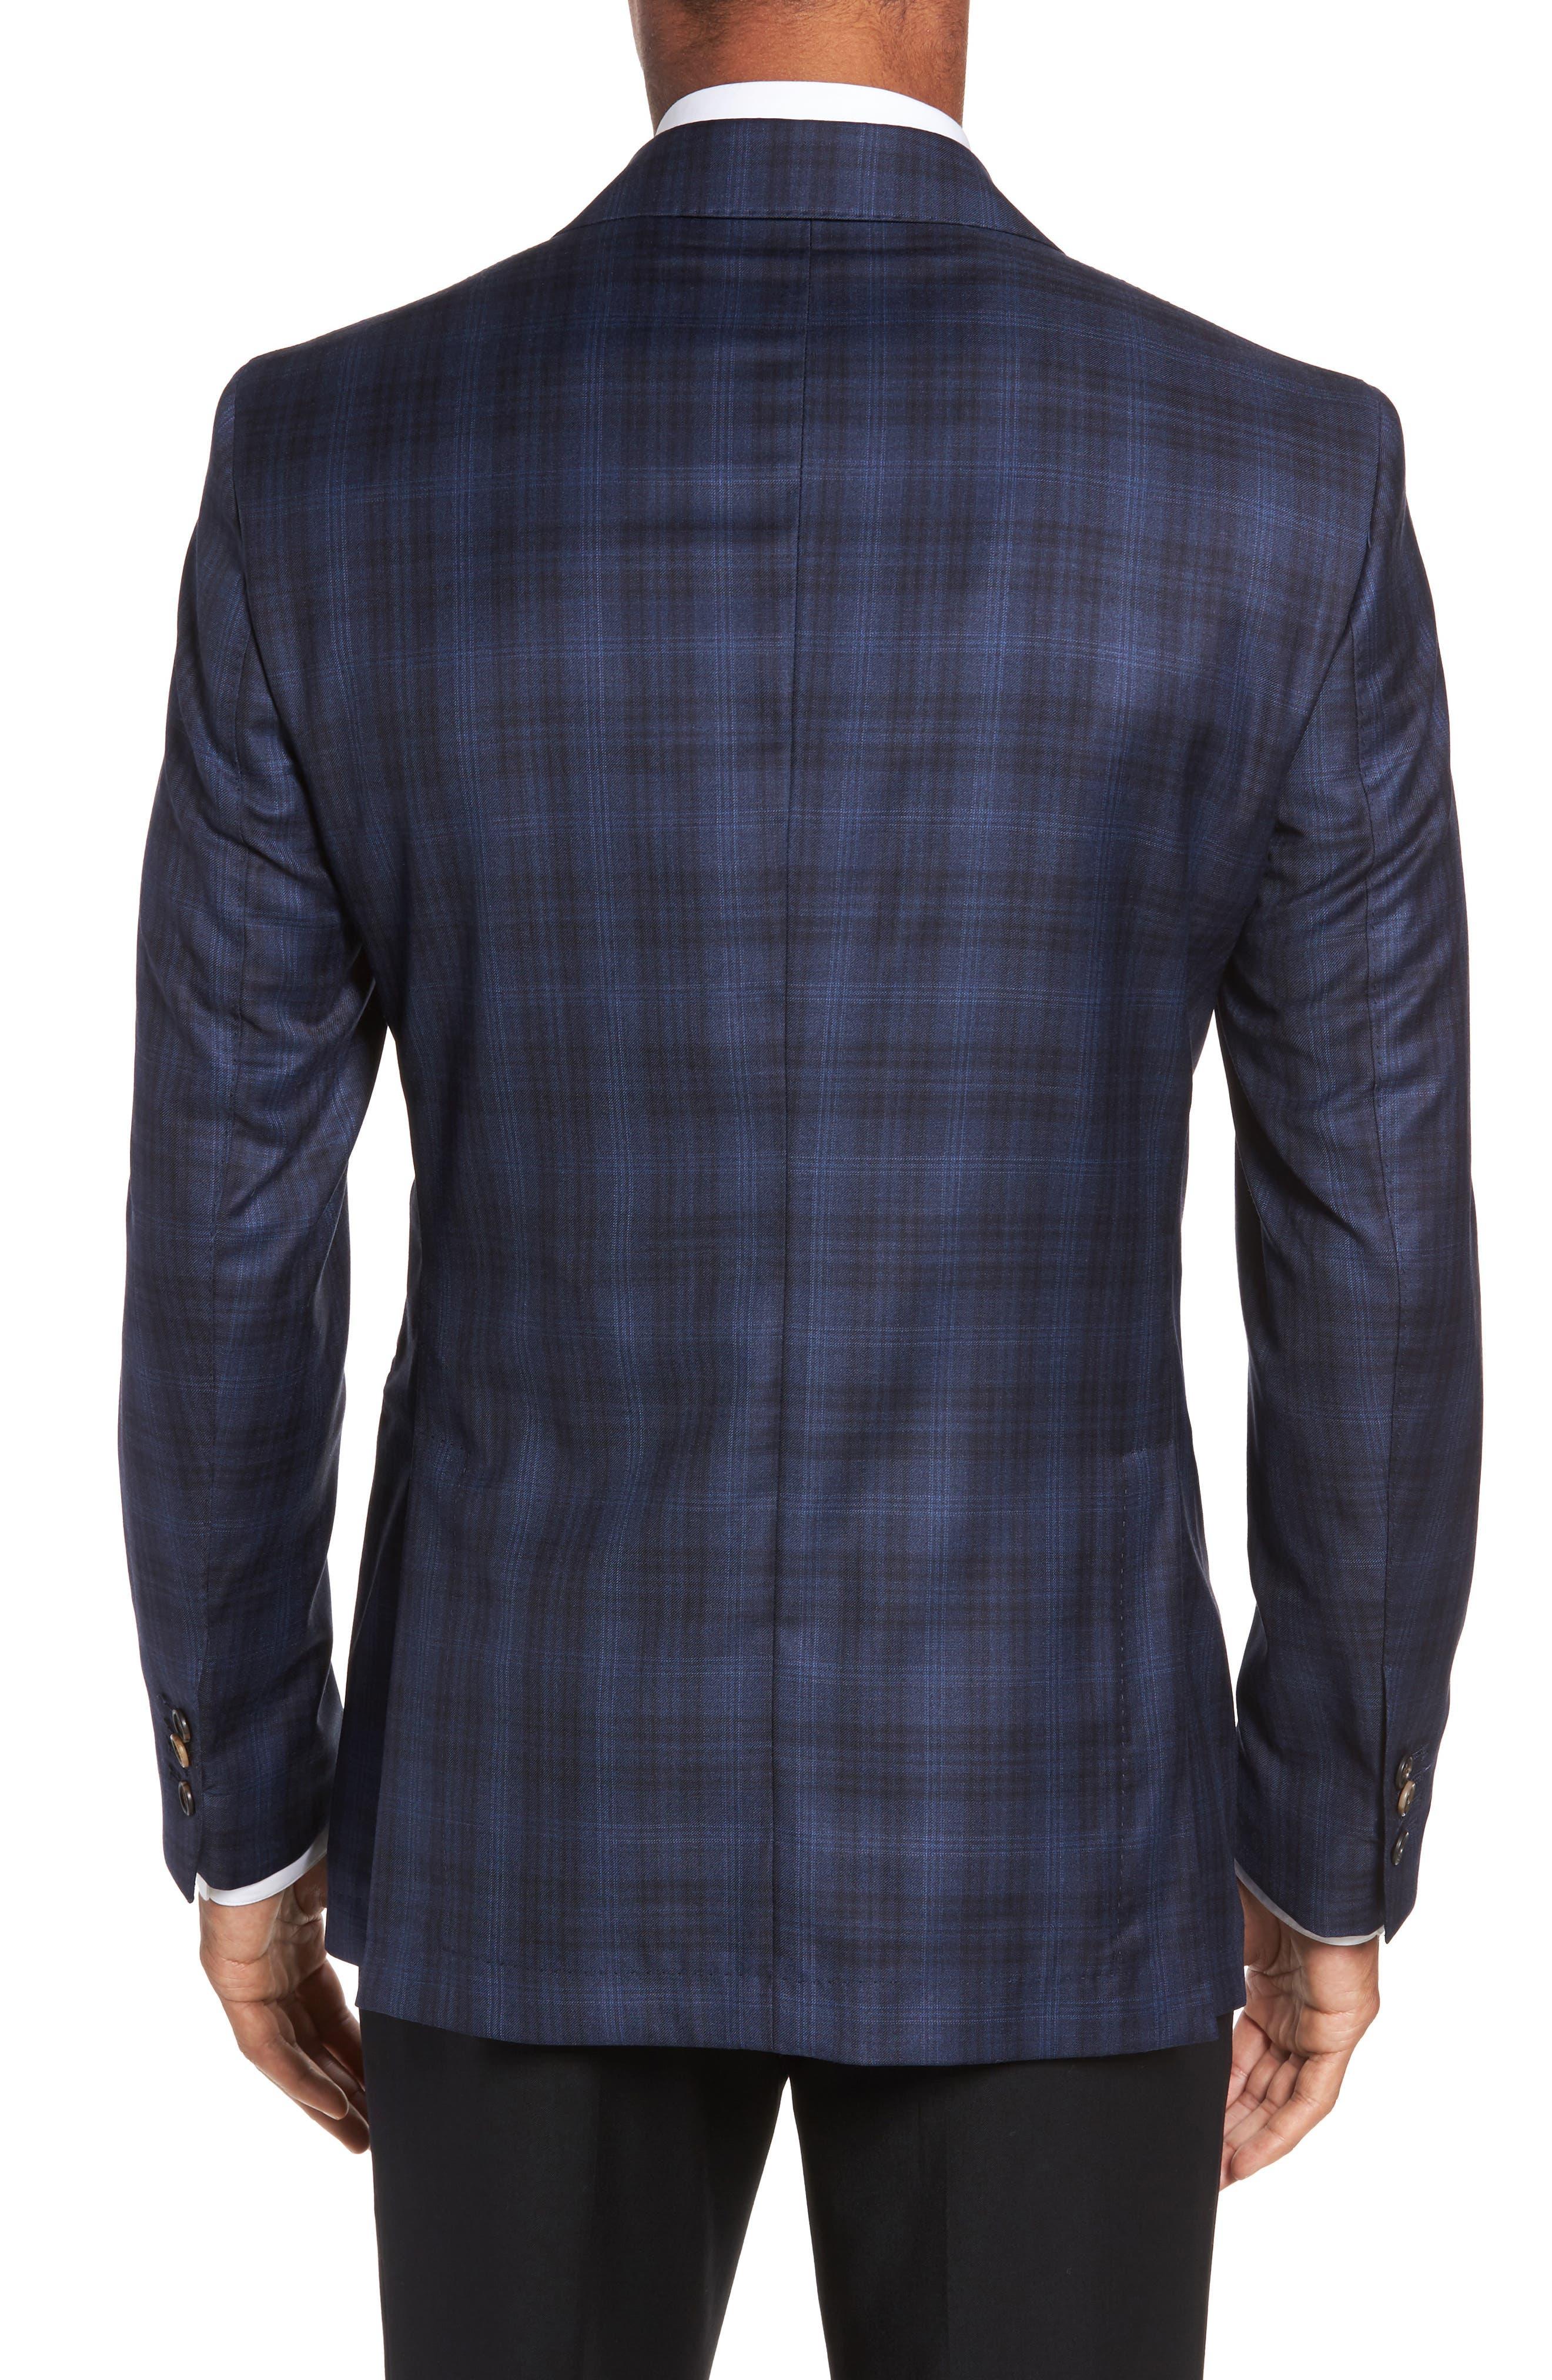 Midnatt Trim Fit Plaid Wool Sport Coat,                             Alternate thumbnail 2, color,                             Black Iris